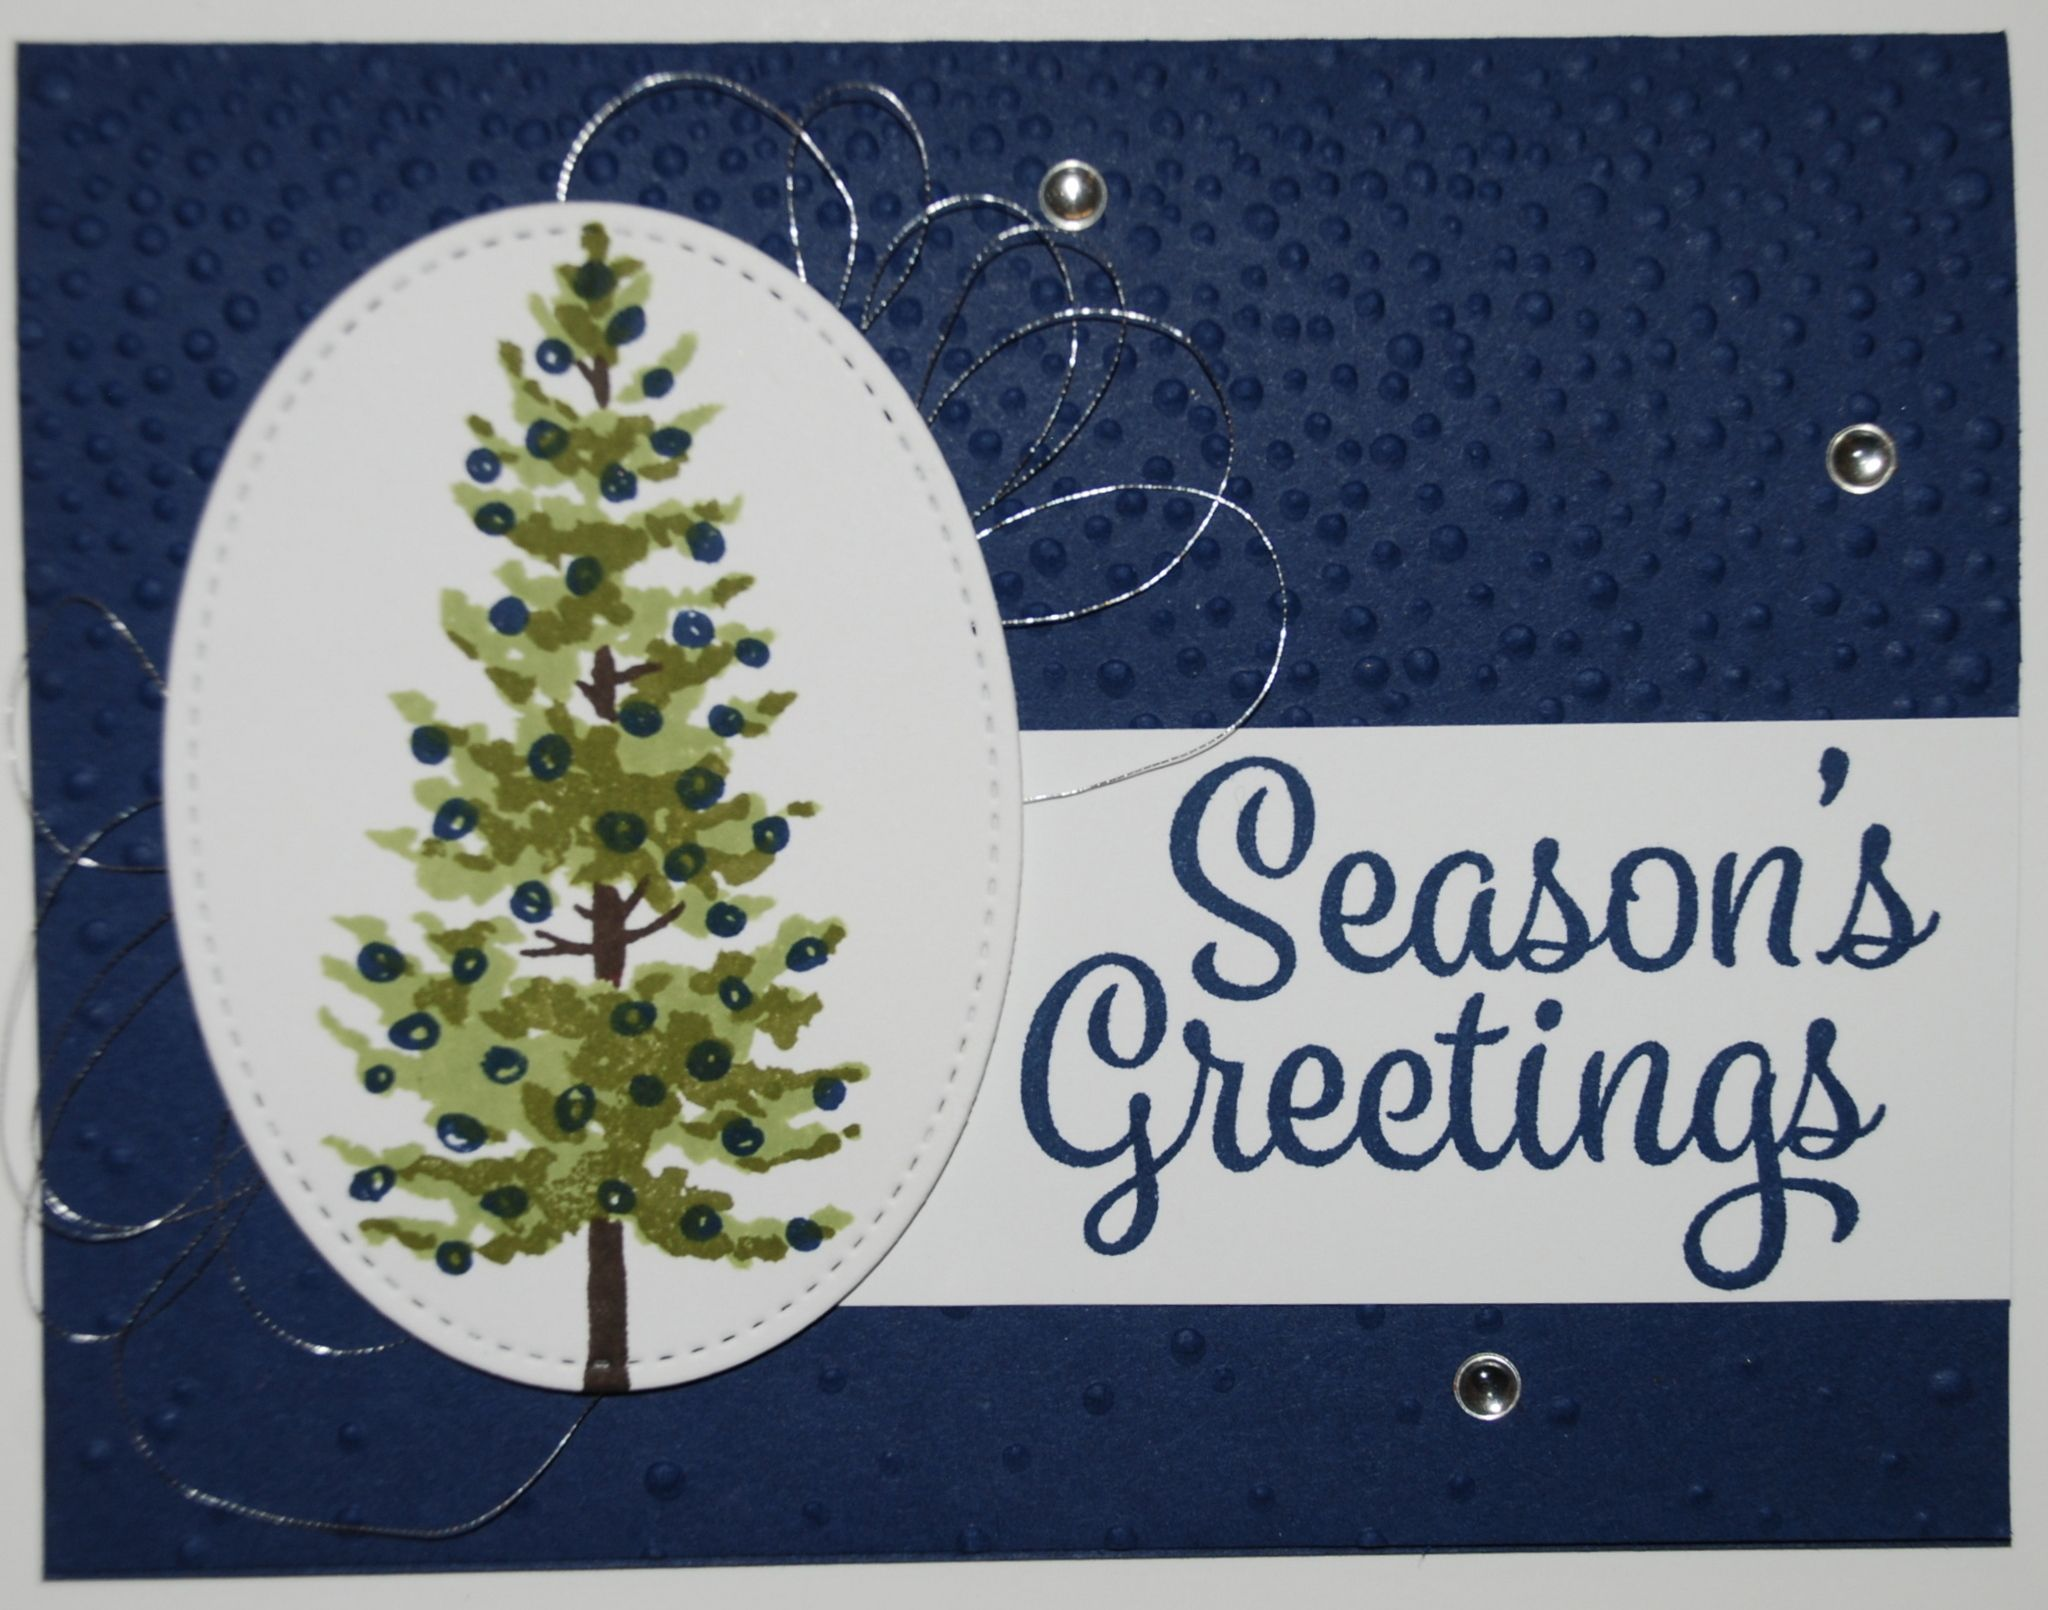 Stampin up seasons greetings card season like christmas stampin up seasons greetings card season like christmas photopolymer snowflake sentiments stamp kristyandbryce Choice Image